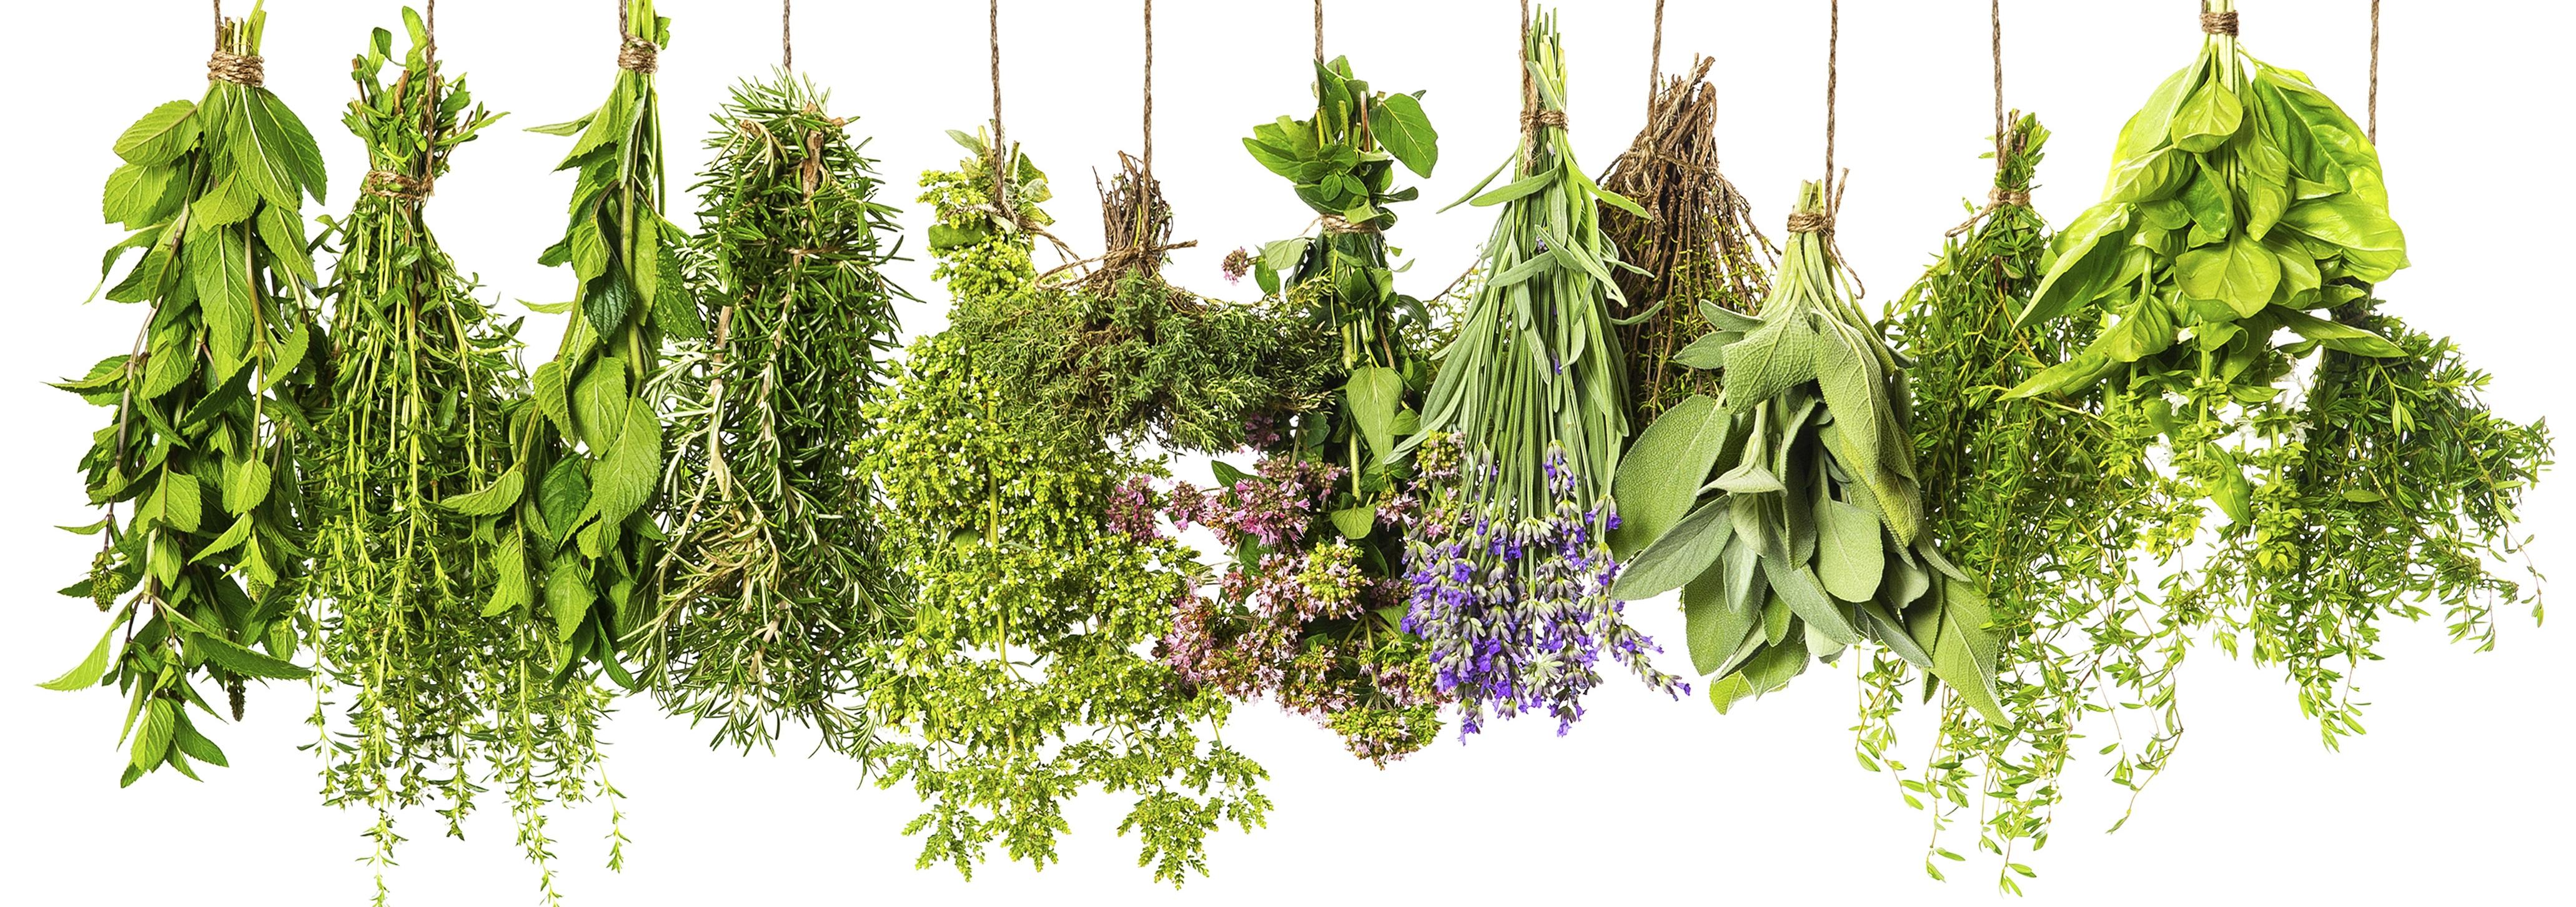 herbs-category.jpg